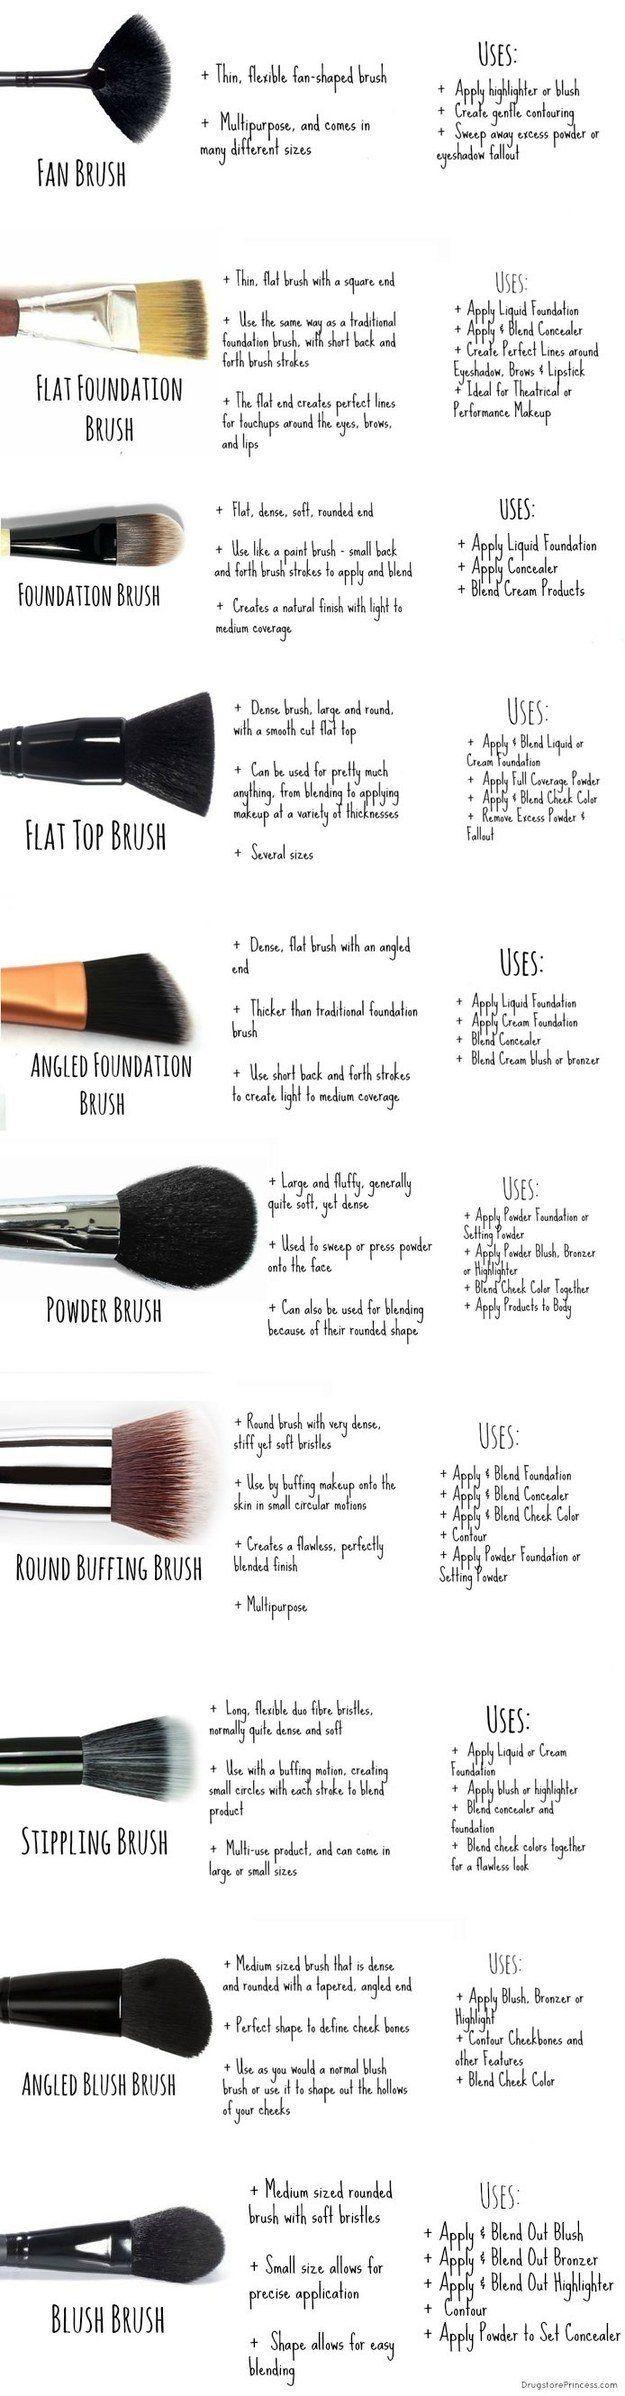 Makeup Brushes 101 | How To Use Your SetFacebookGoogle+InstagramPinterestTumblrT...